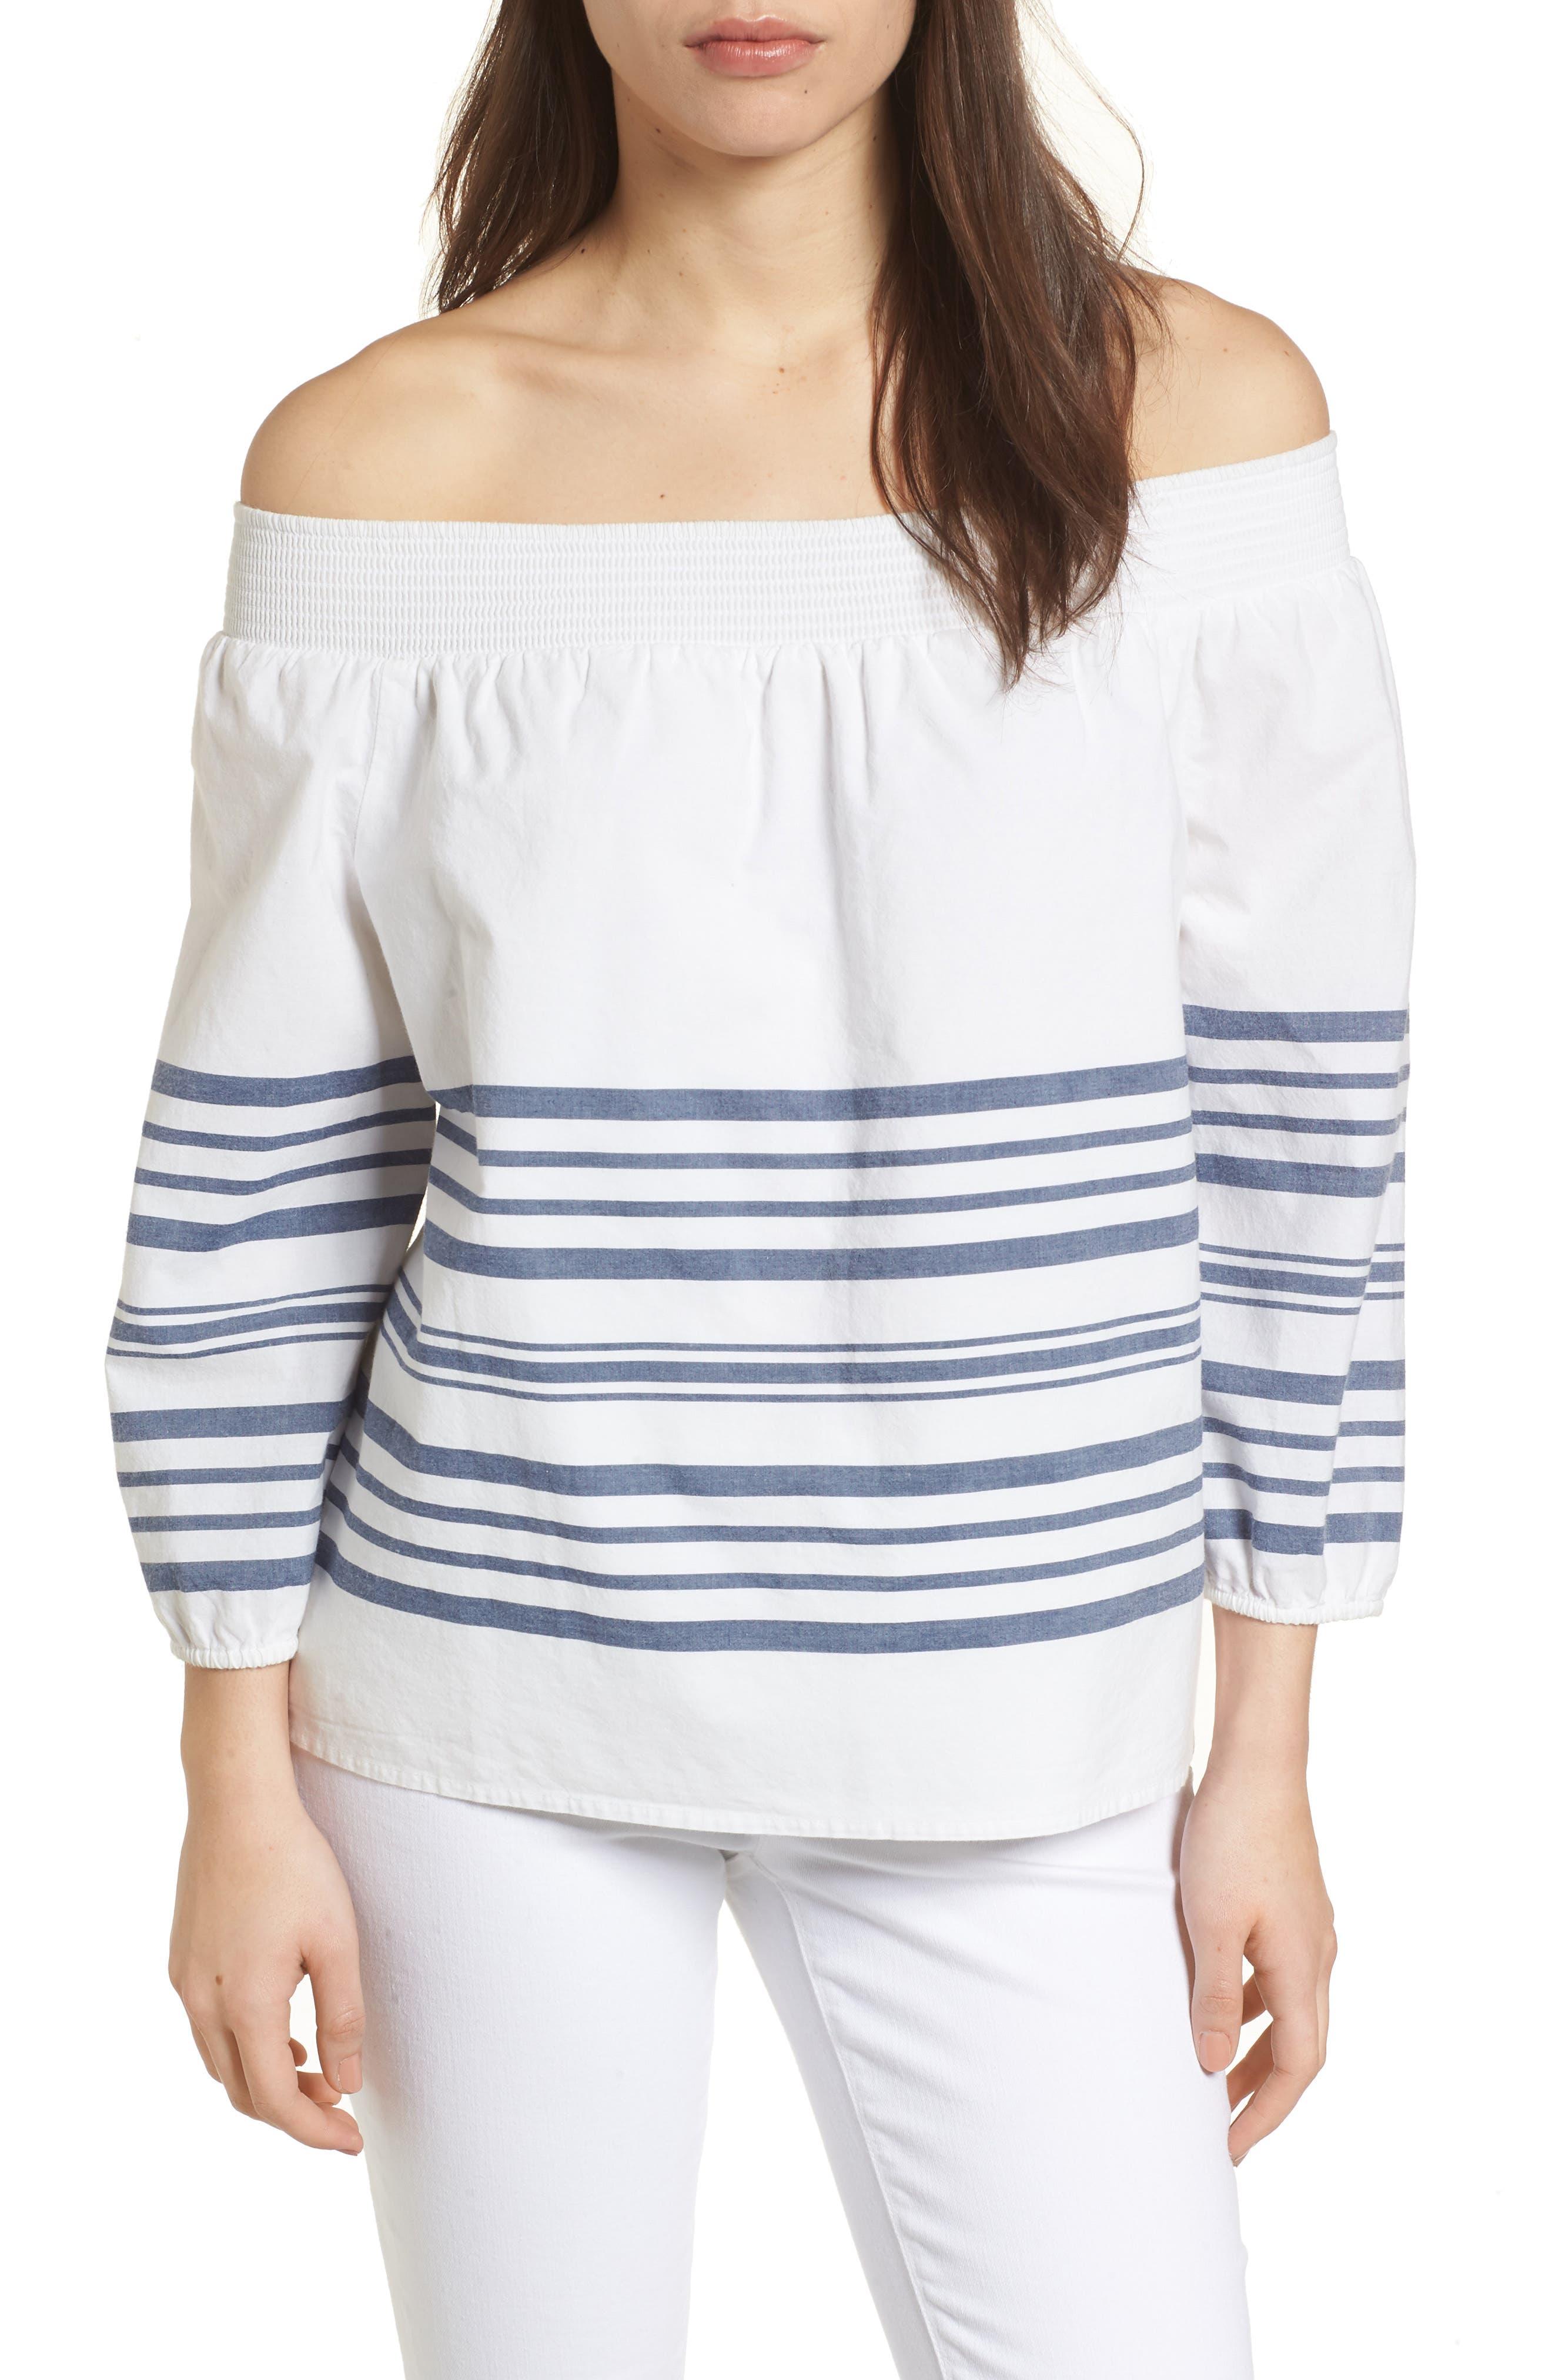 Breaker Stripe Off the Shoulder Cotton Top,                         Main,                         color, White Cap